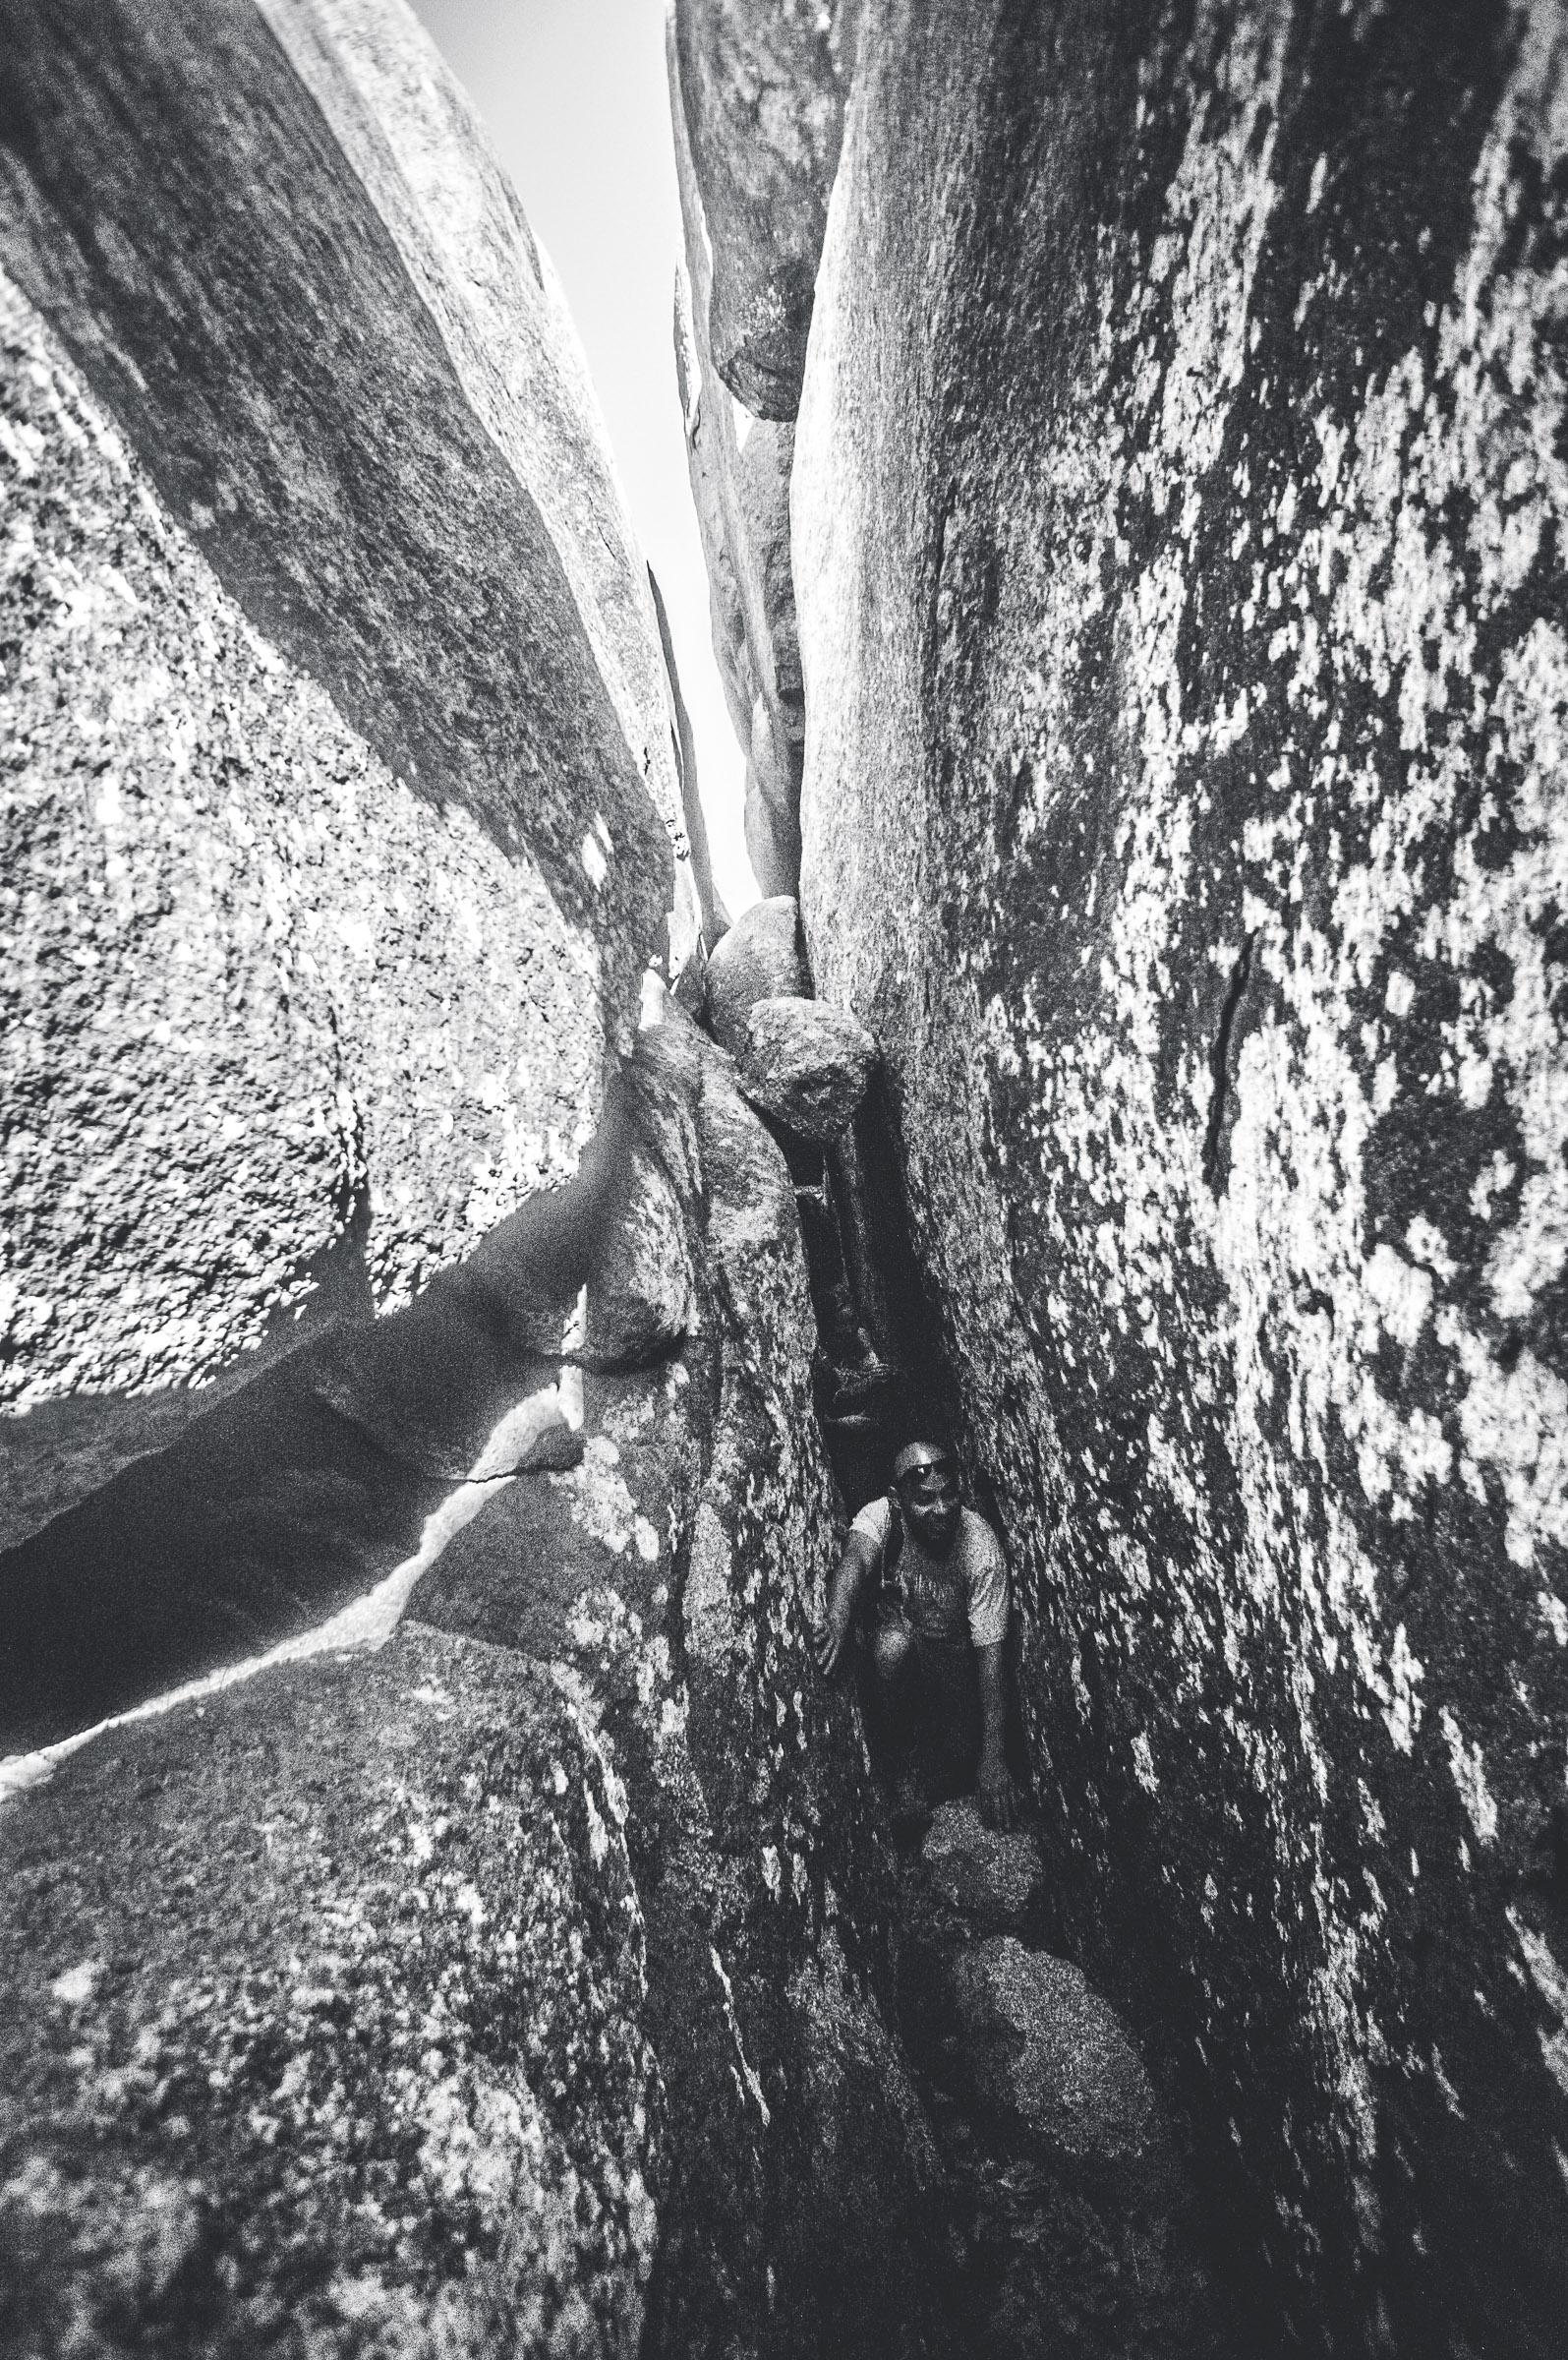 Spanish Cave 11-12-16 B&W (21 of 33).JPG